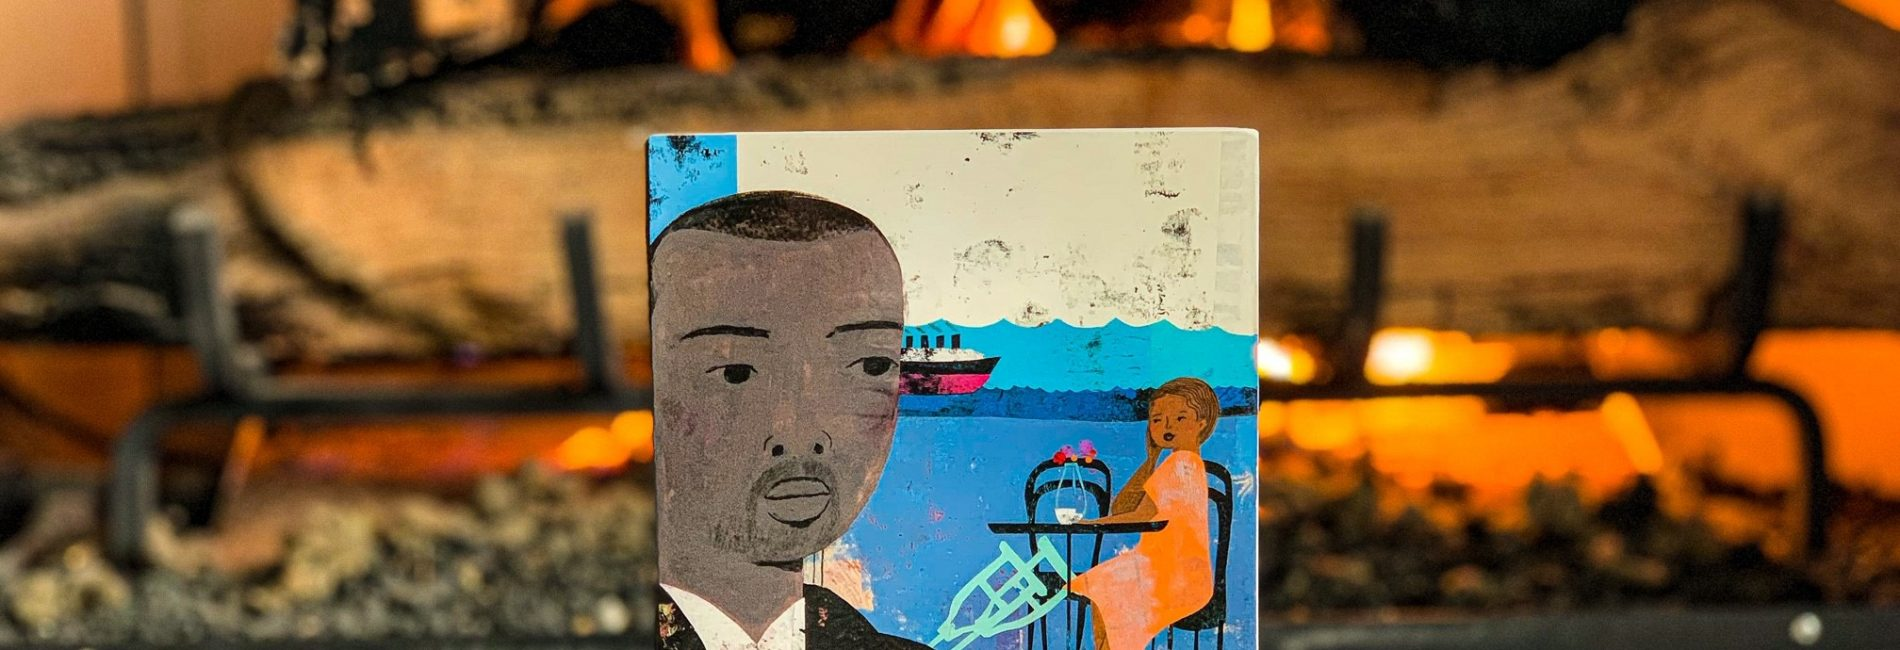 THE ZEG BOOKCLUB: ROMANCE IN MARSEILLE